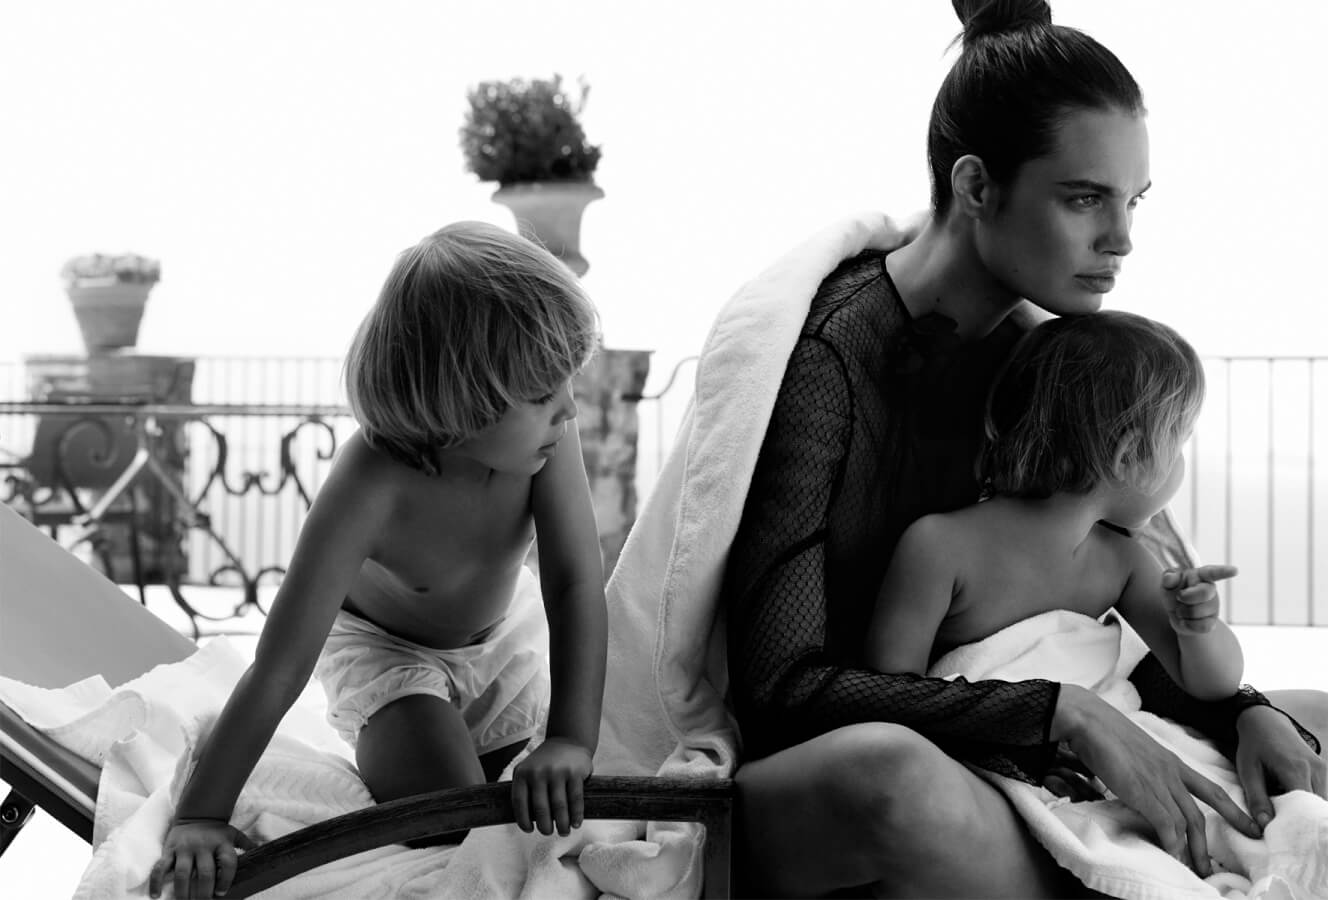 05_Alvaro_Beamud_Cortes_Air_France_Madame_Capri